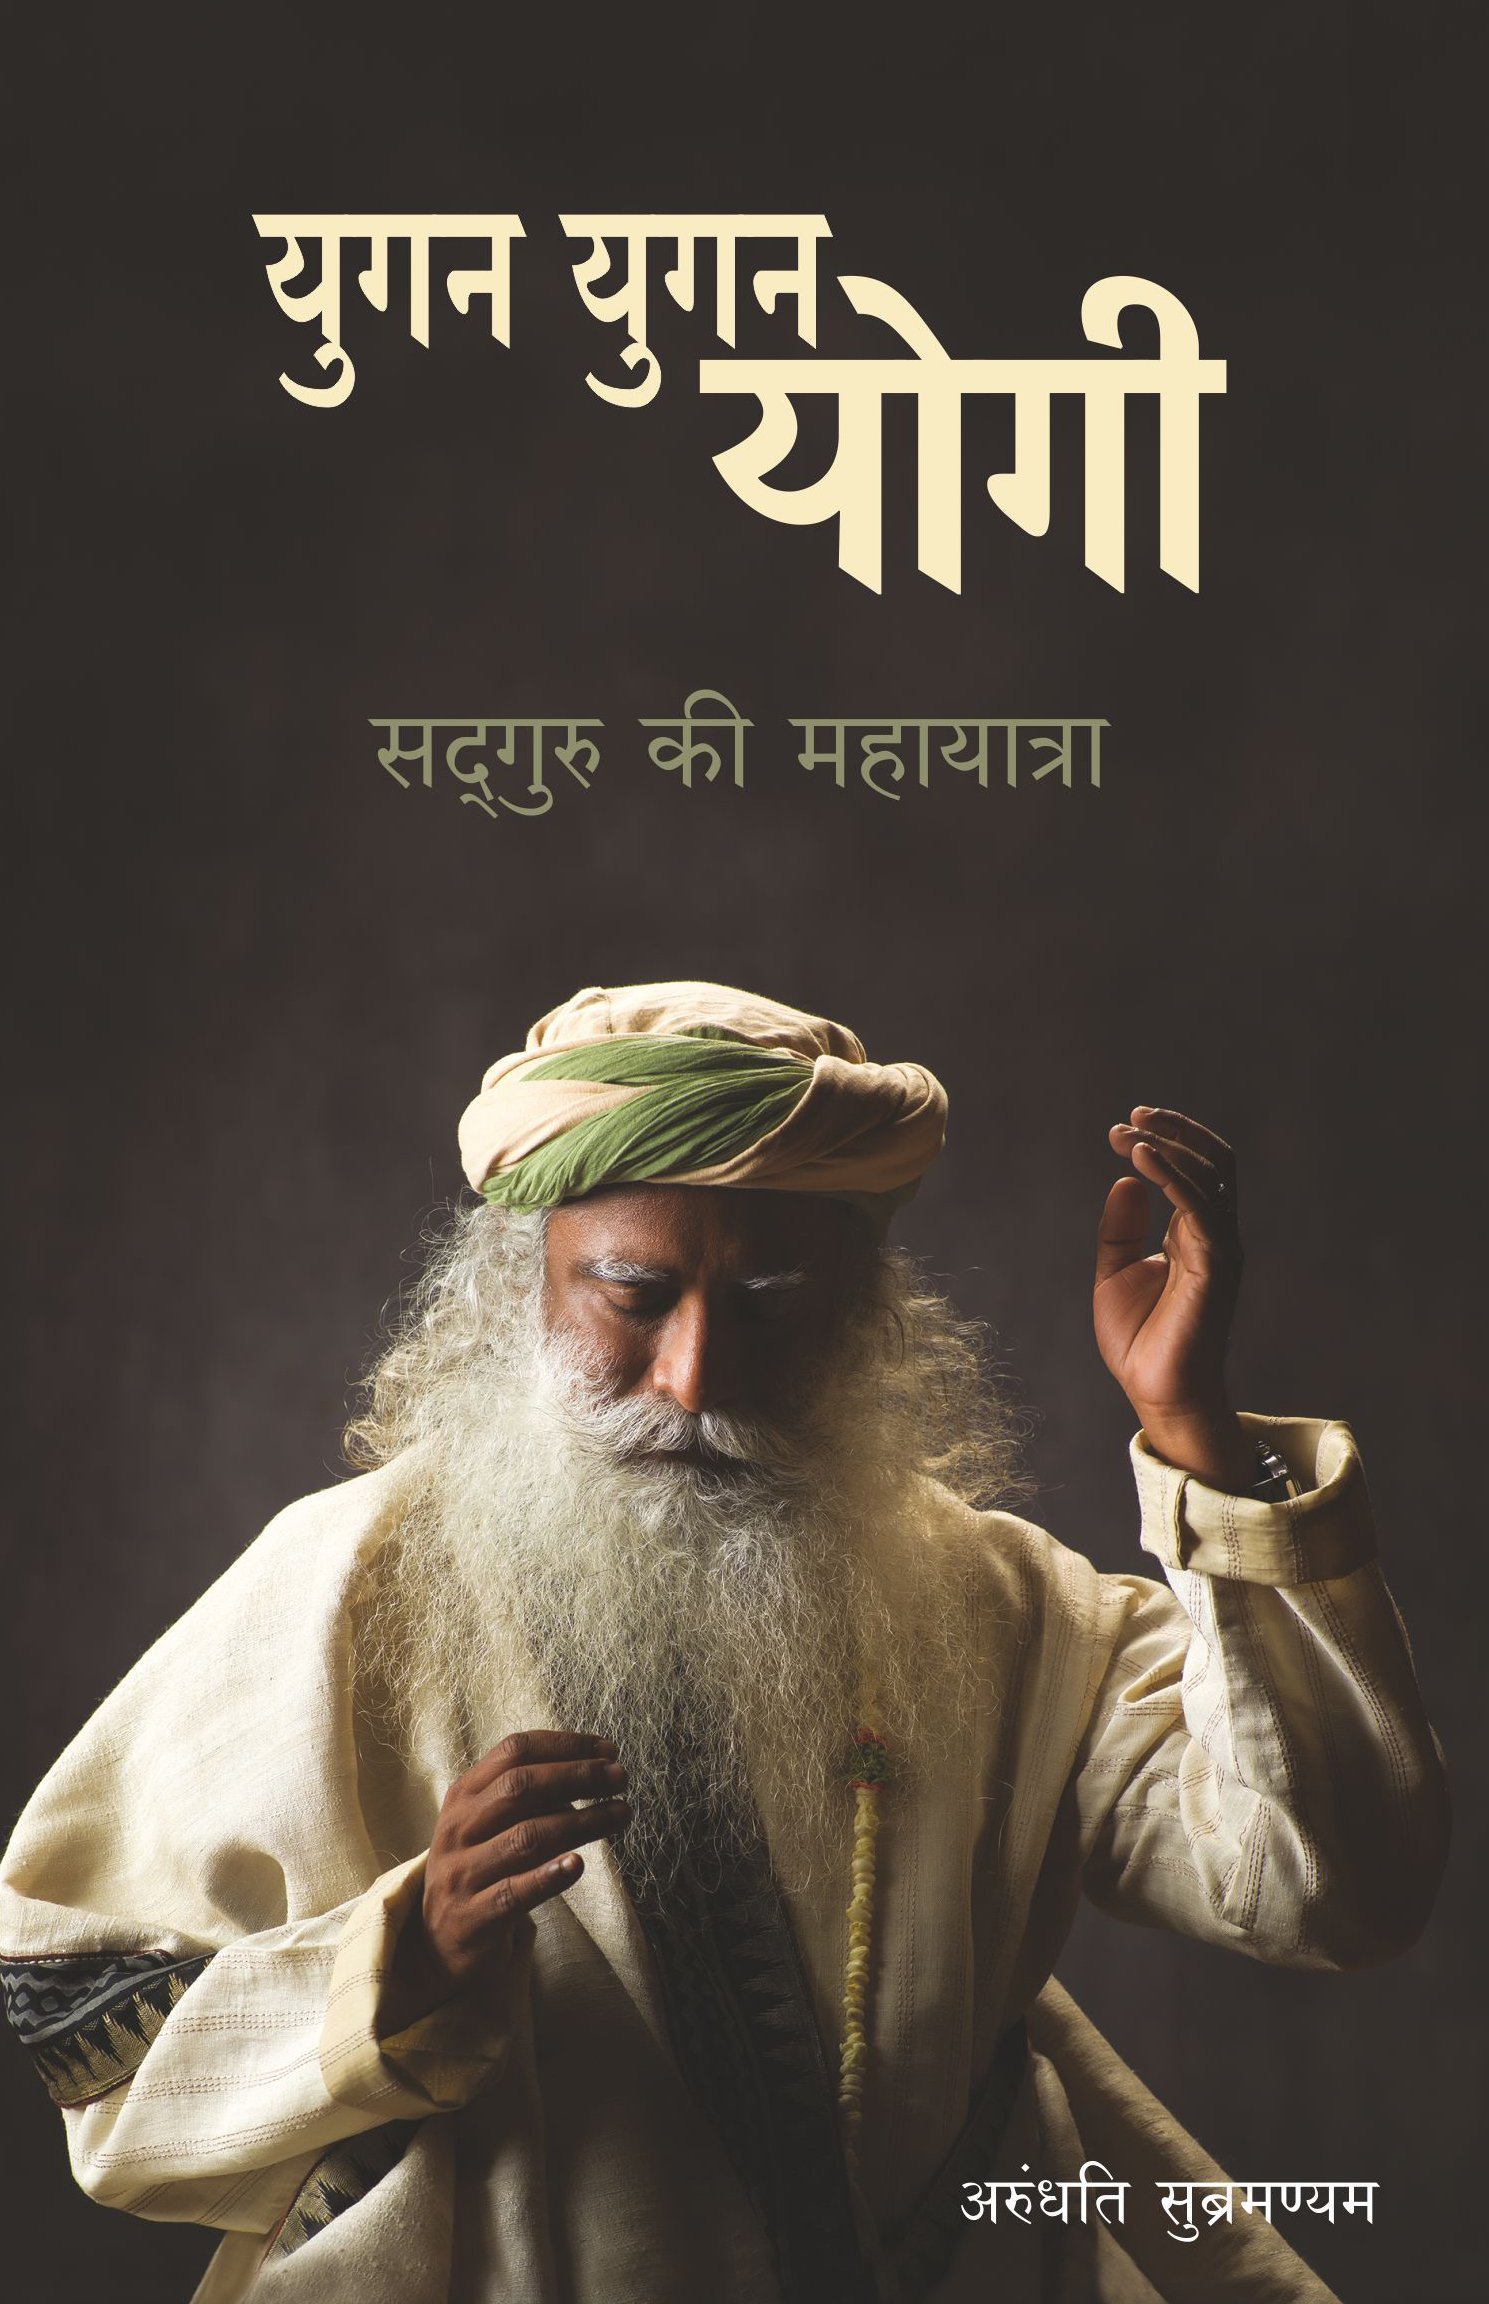 yugan yugan yogi book in hindi pdf free download